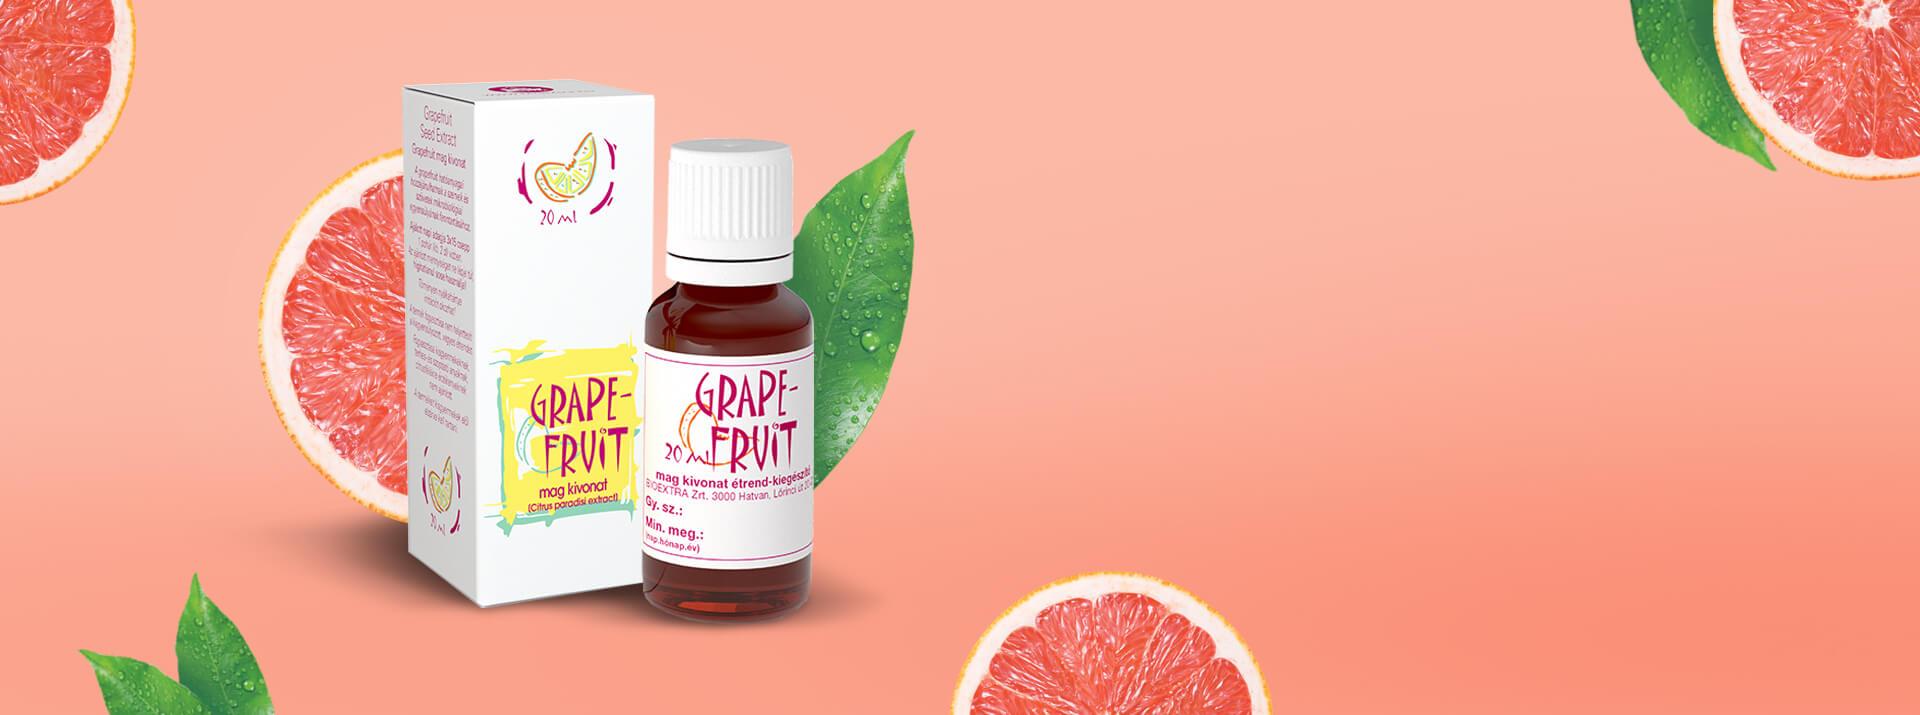 Valódi grapefruit, igazi erő!